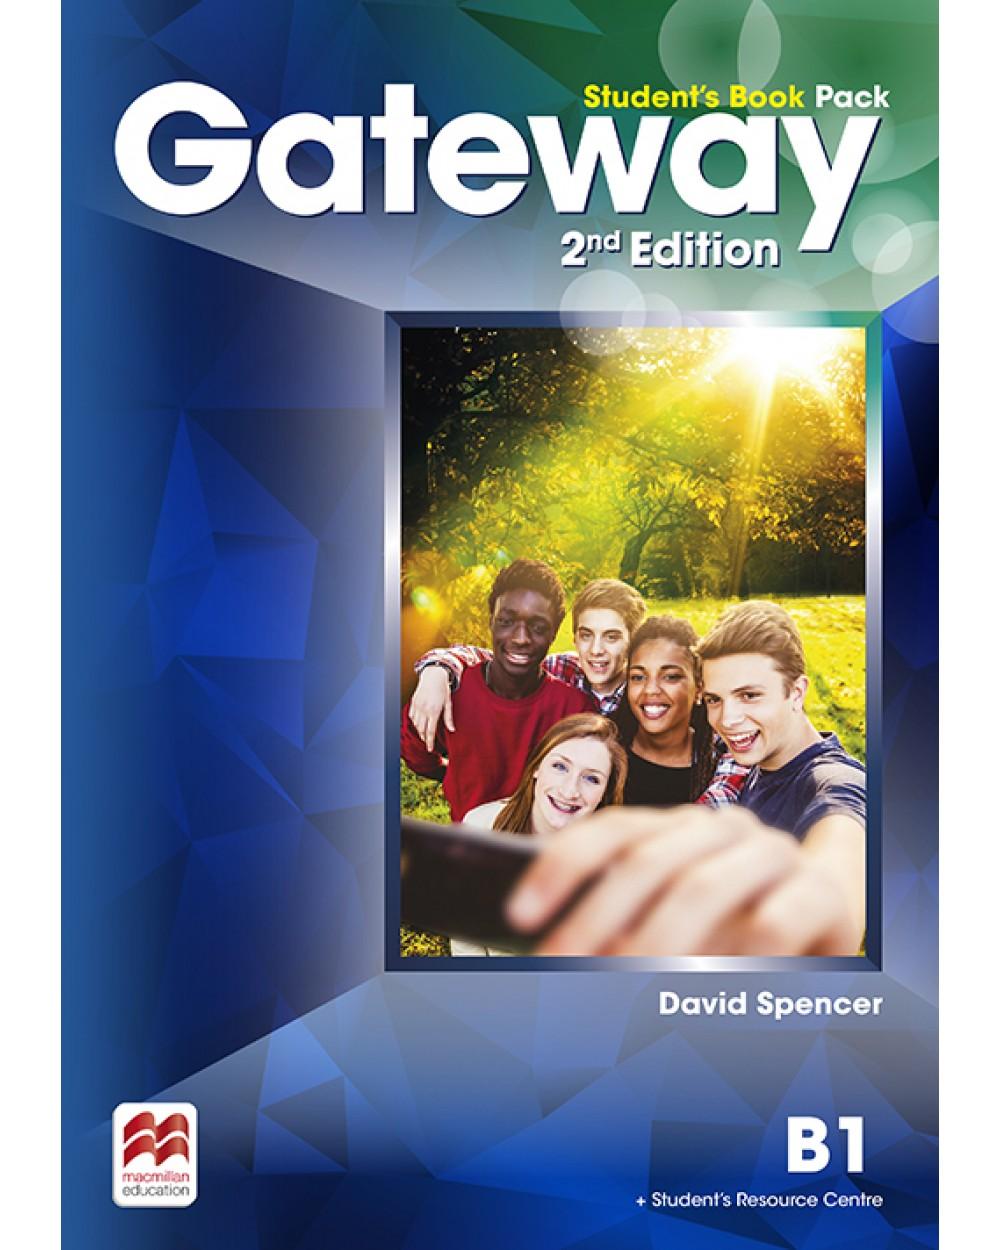 GATEWAY 2ND EDITION STUDENT'S BOOK PACK W/WORKBOOK-B1